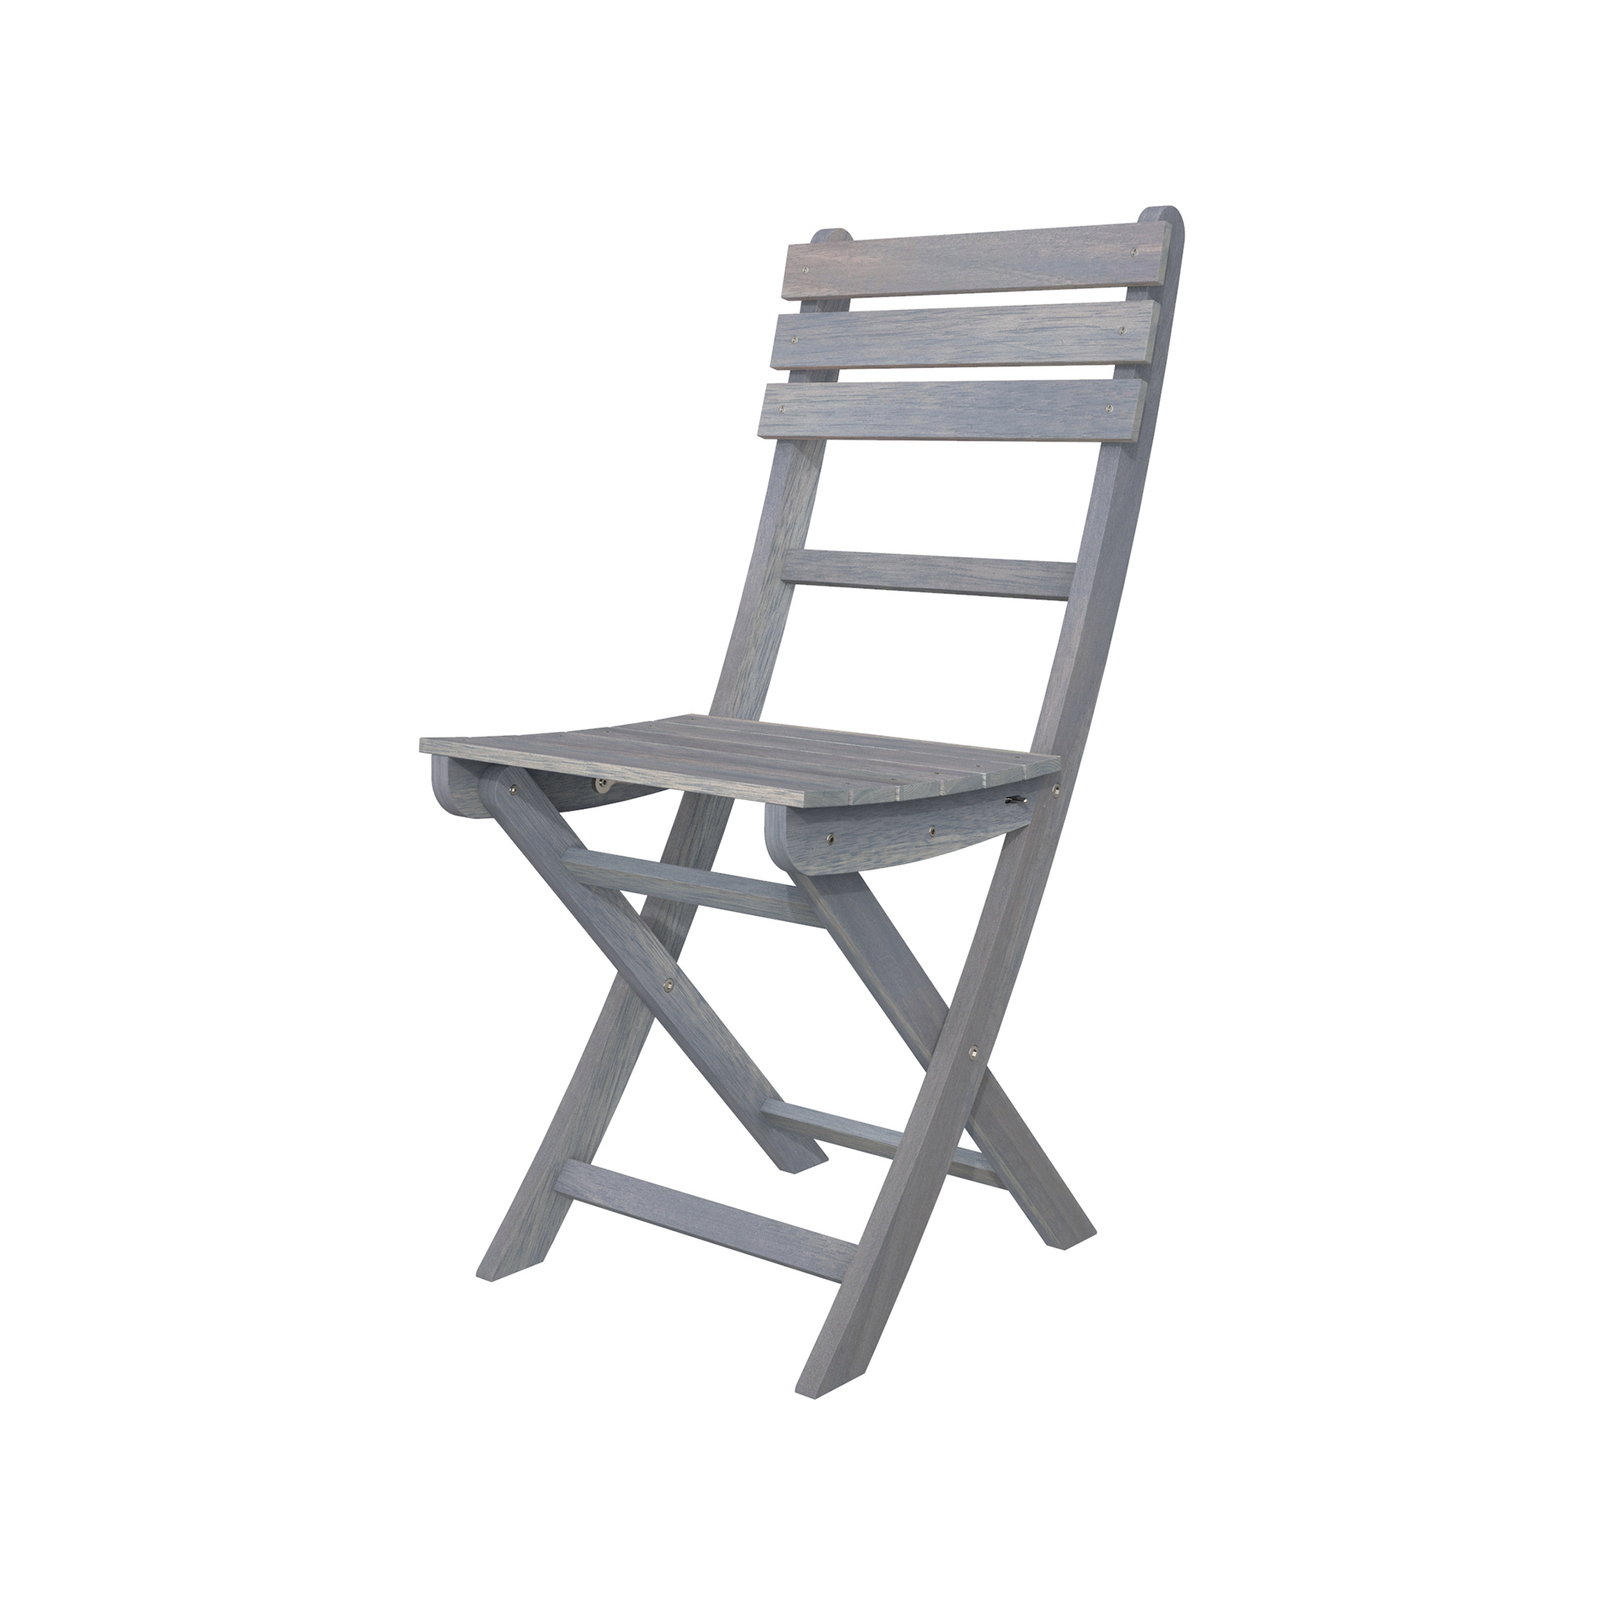 Interbuild Dusk Grey Sofia Folding Chair - 2 Pack